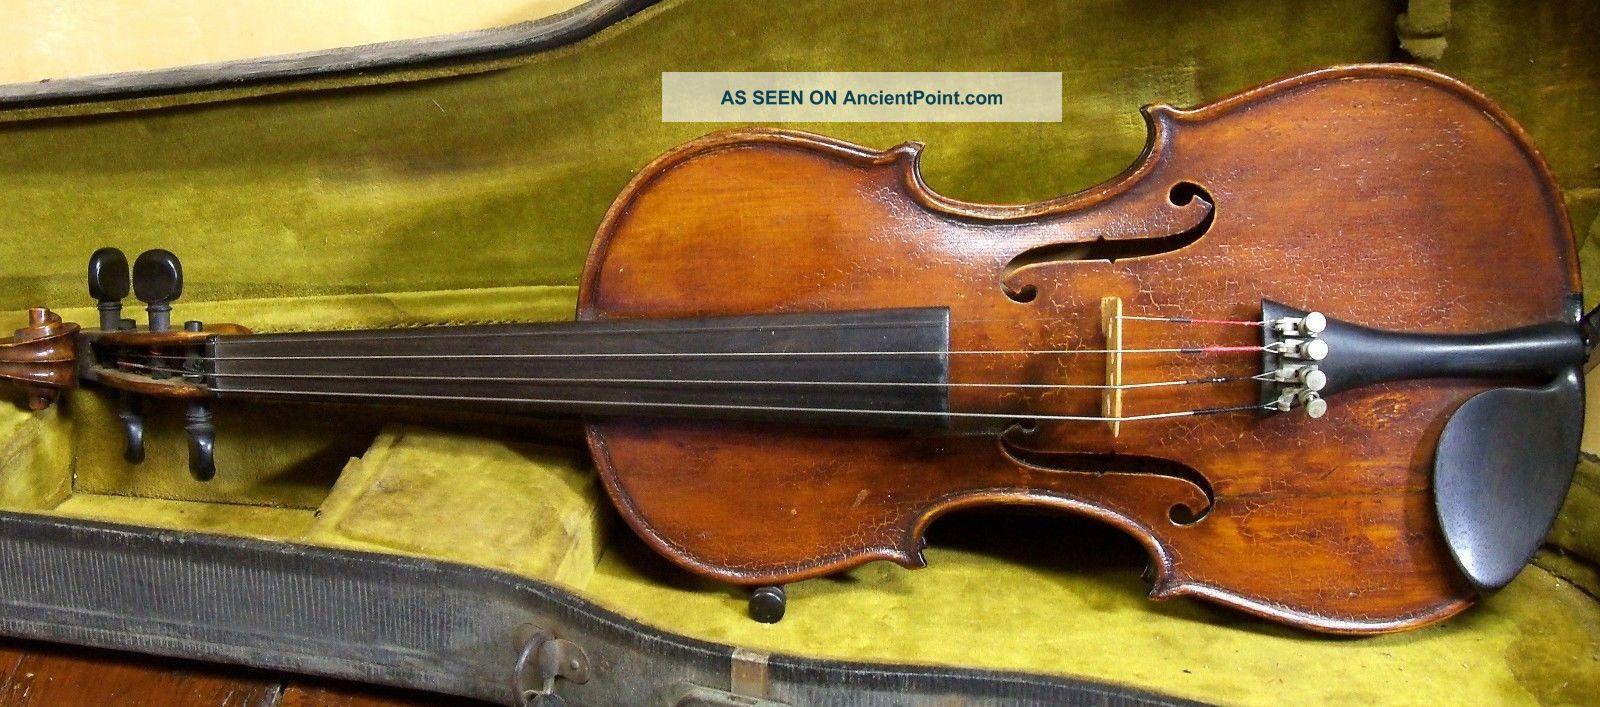 Old American Violin F.  A.  Sennet 1923 String photo